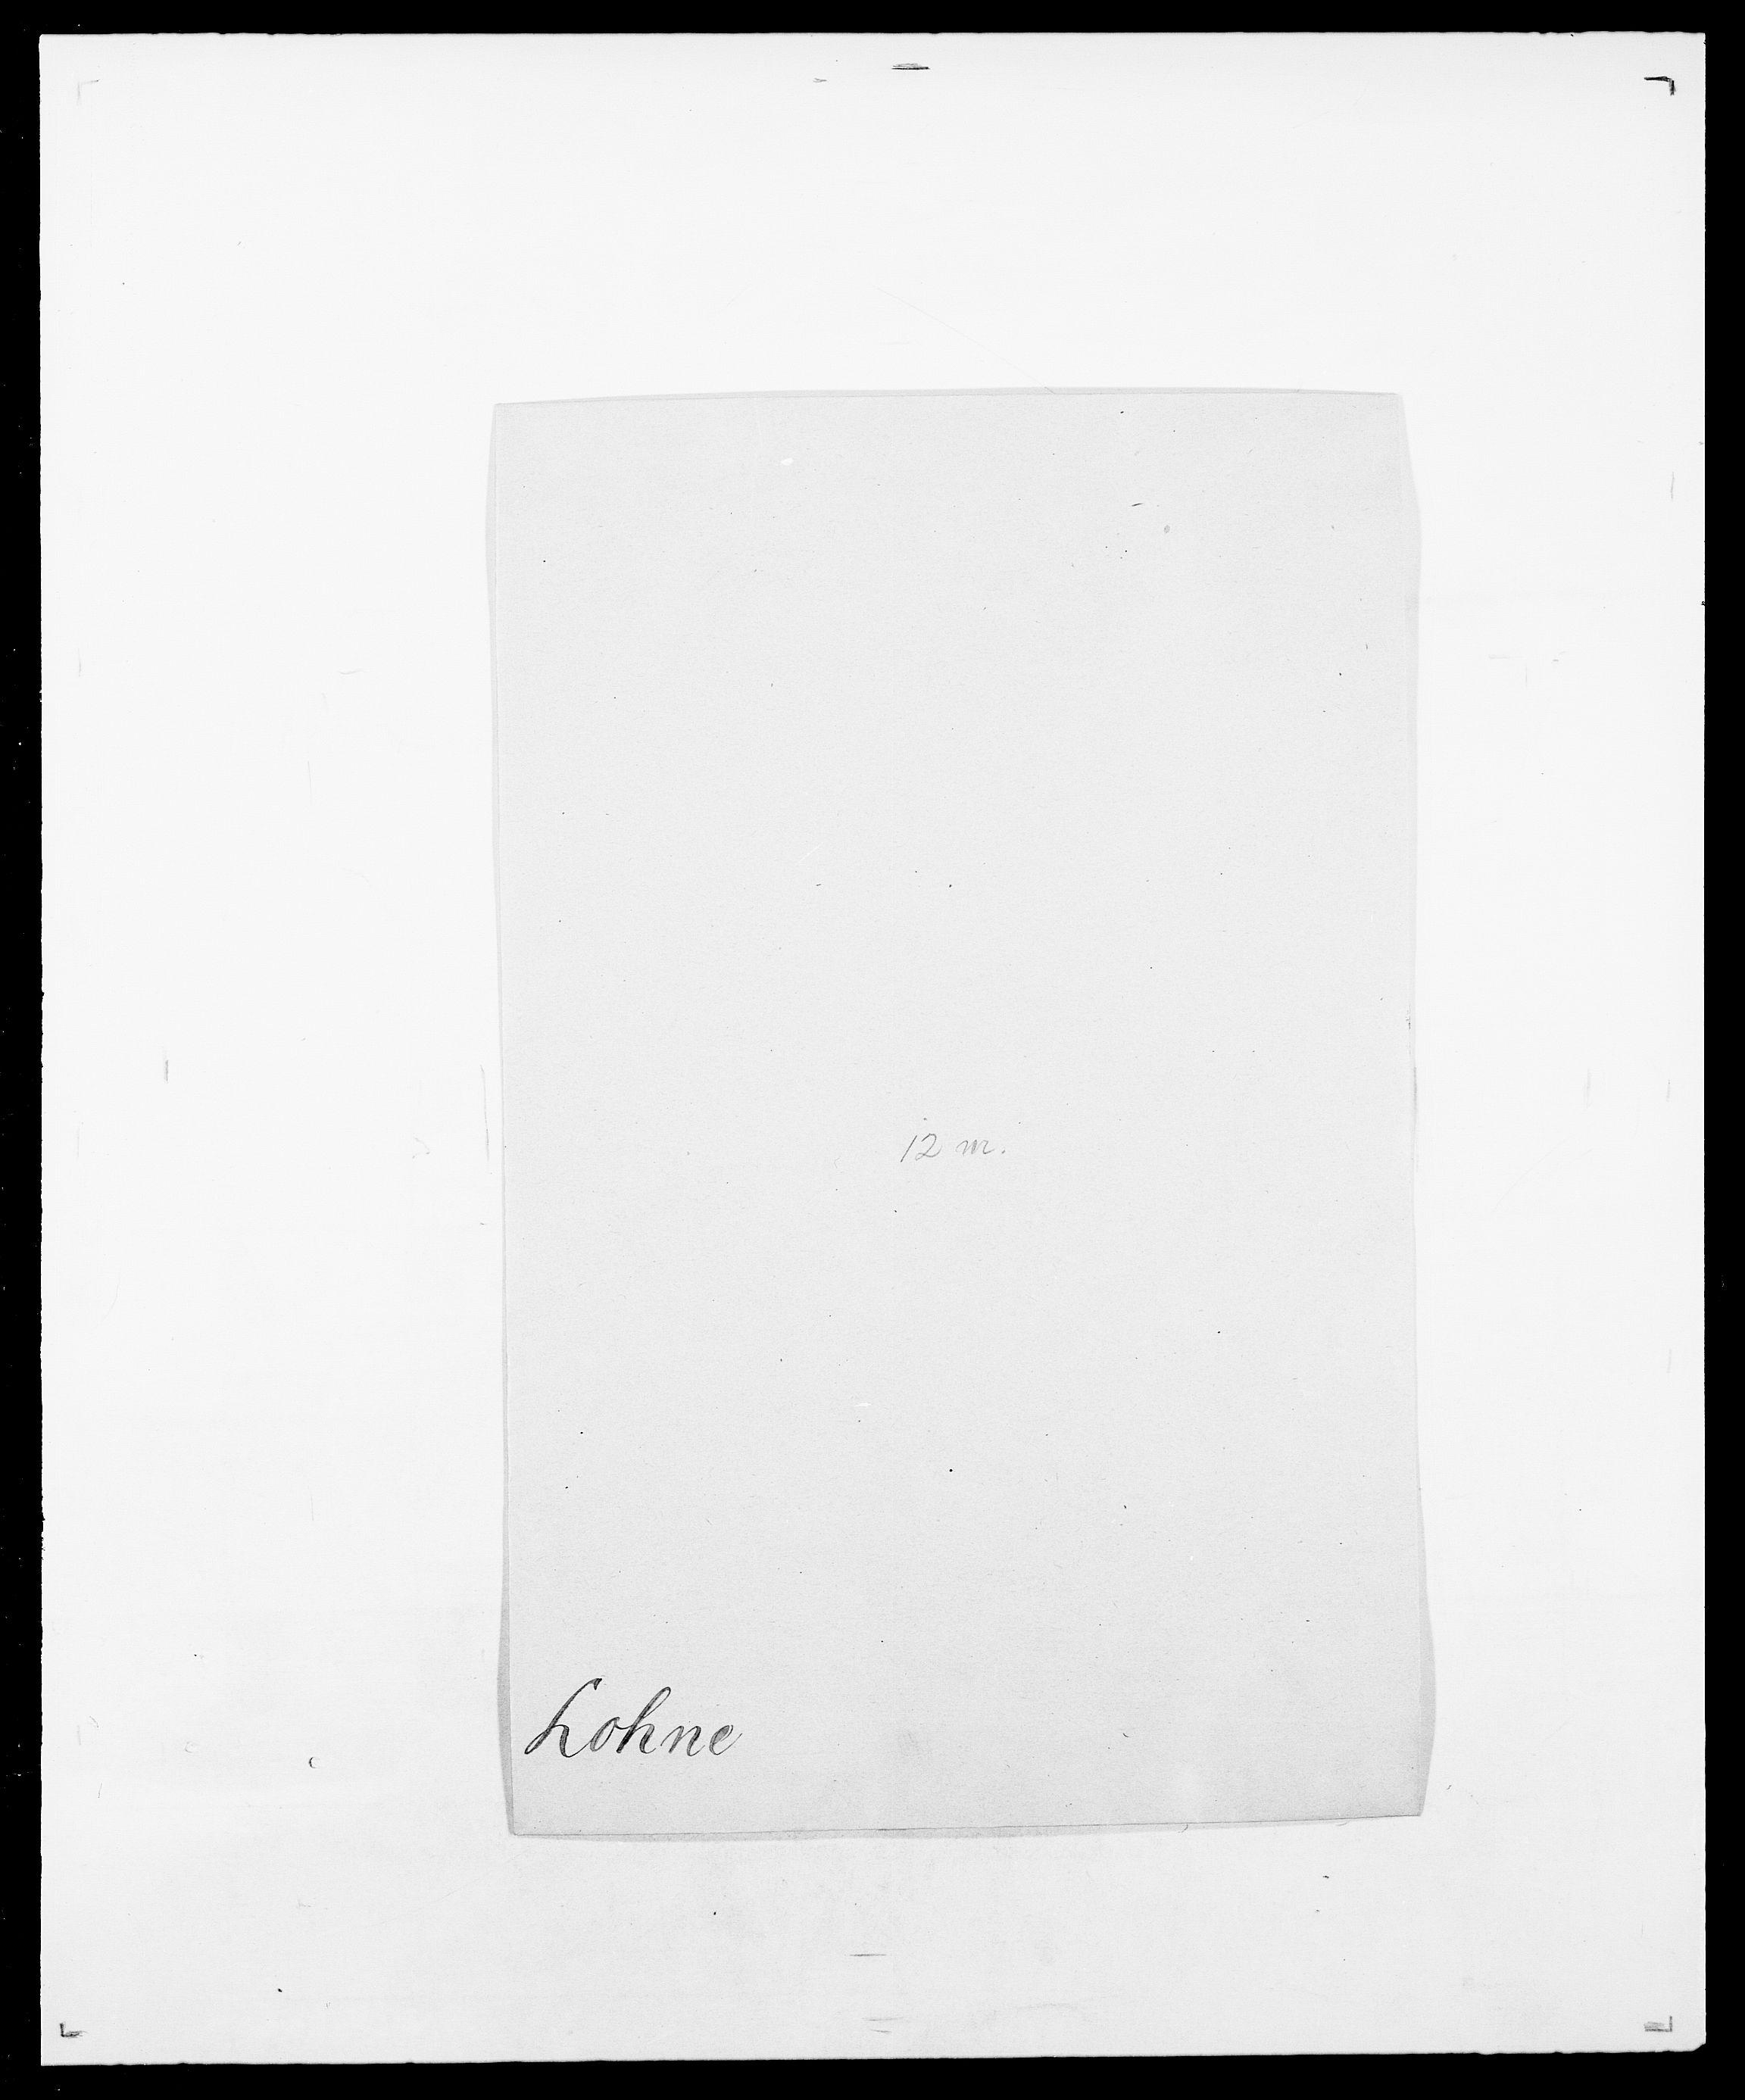 SAO, Delgobe, Charles Antoine - samling, D/Da/L0024: Lobech - Lærum, s. 69